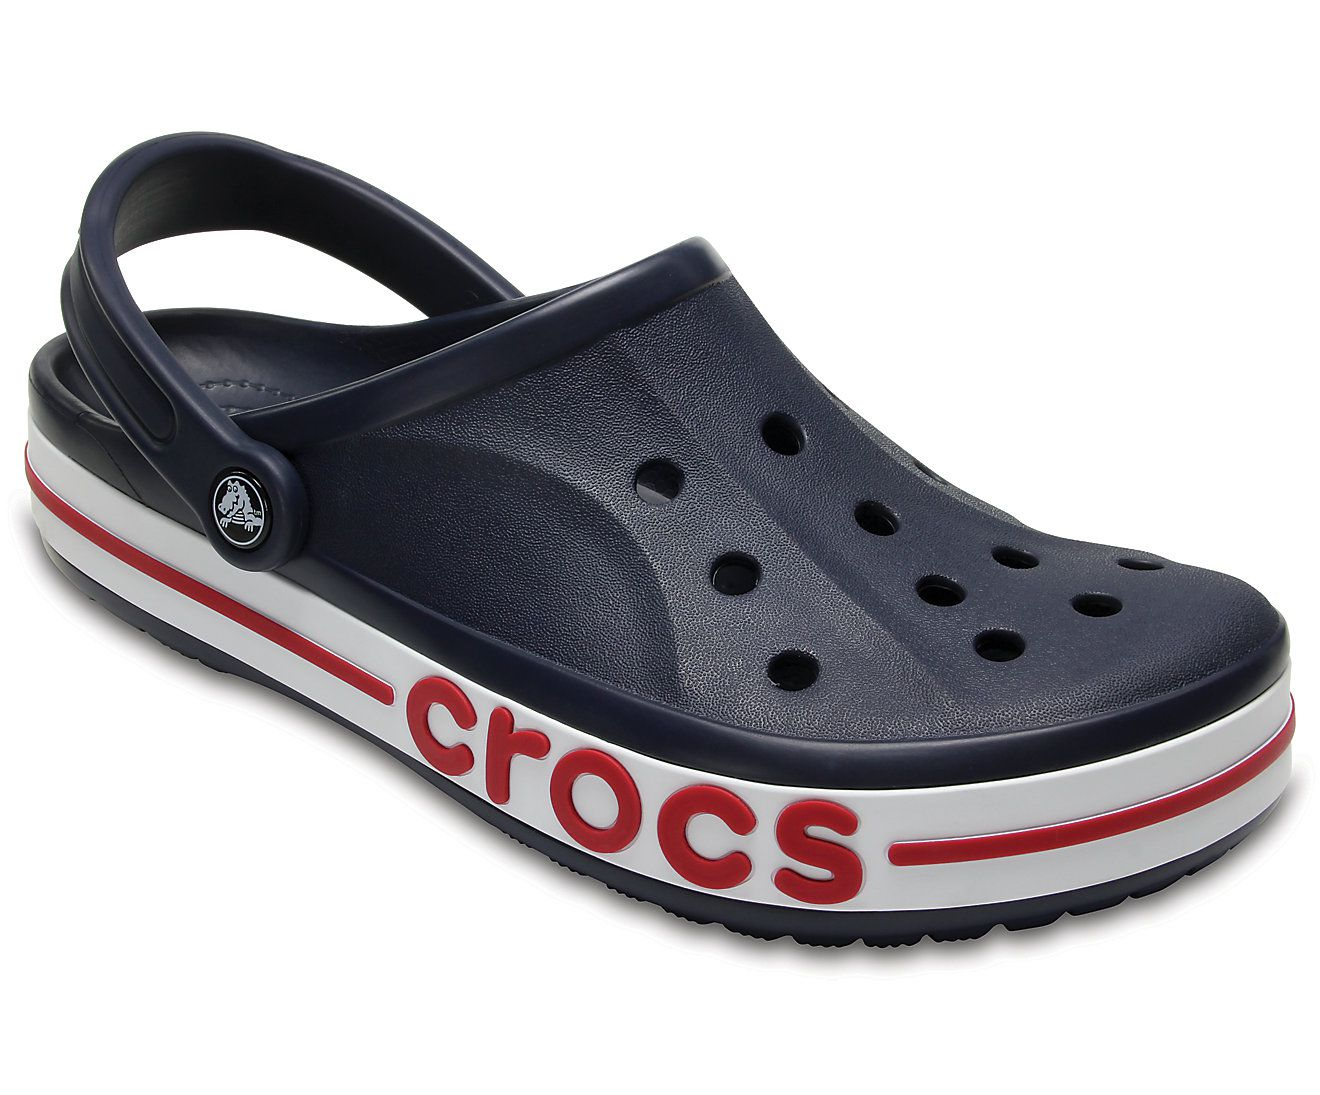 6989f8a70182 Crocs Bayaband Navy Floater Sandals - Buy Crocs Bayaband Navy ...